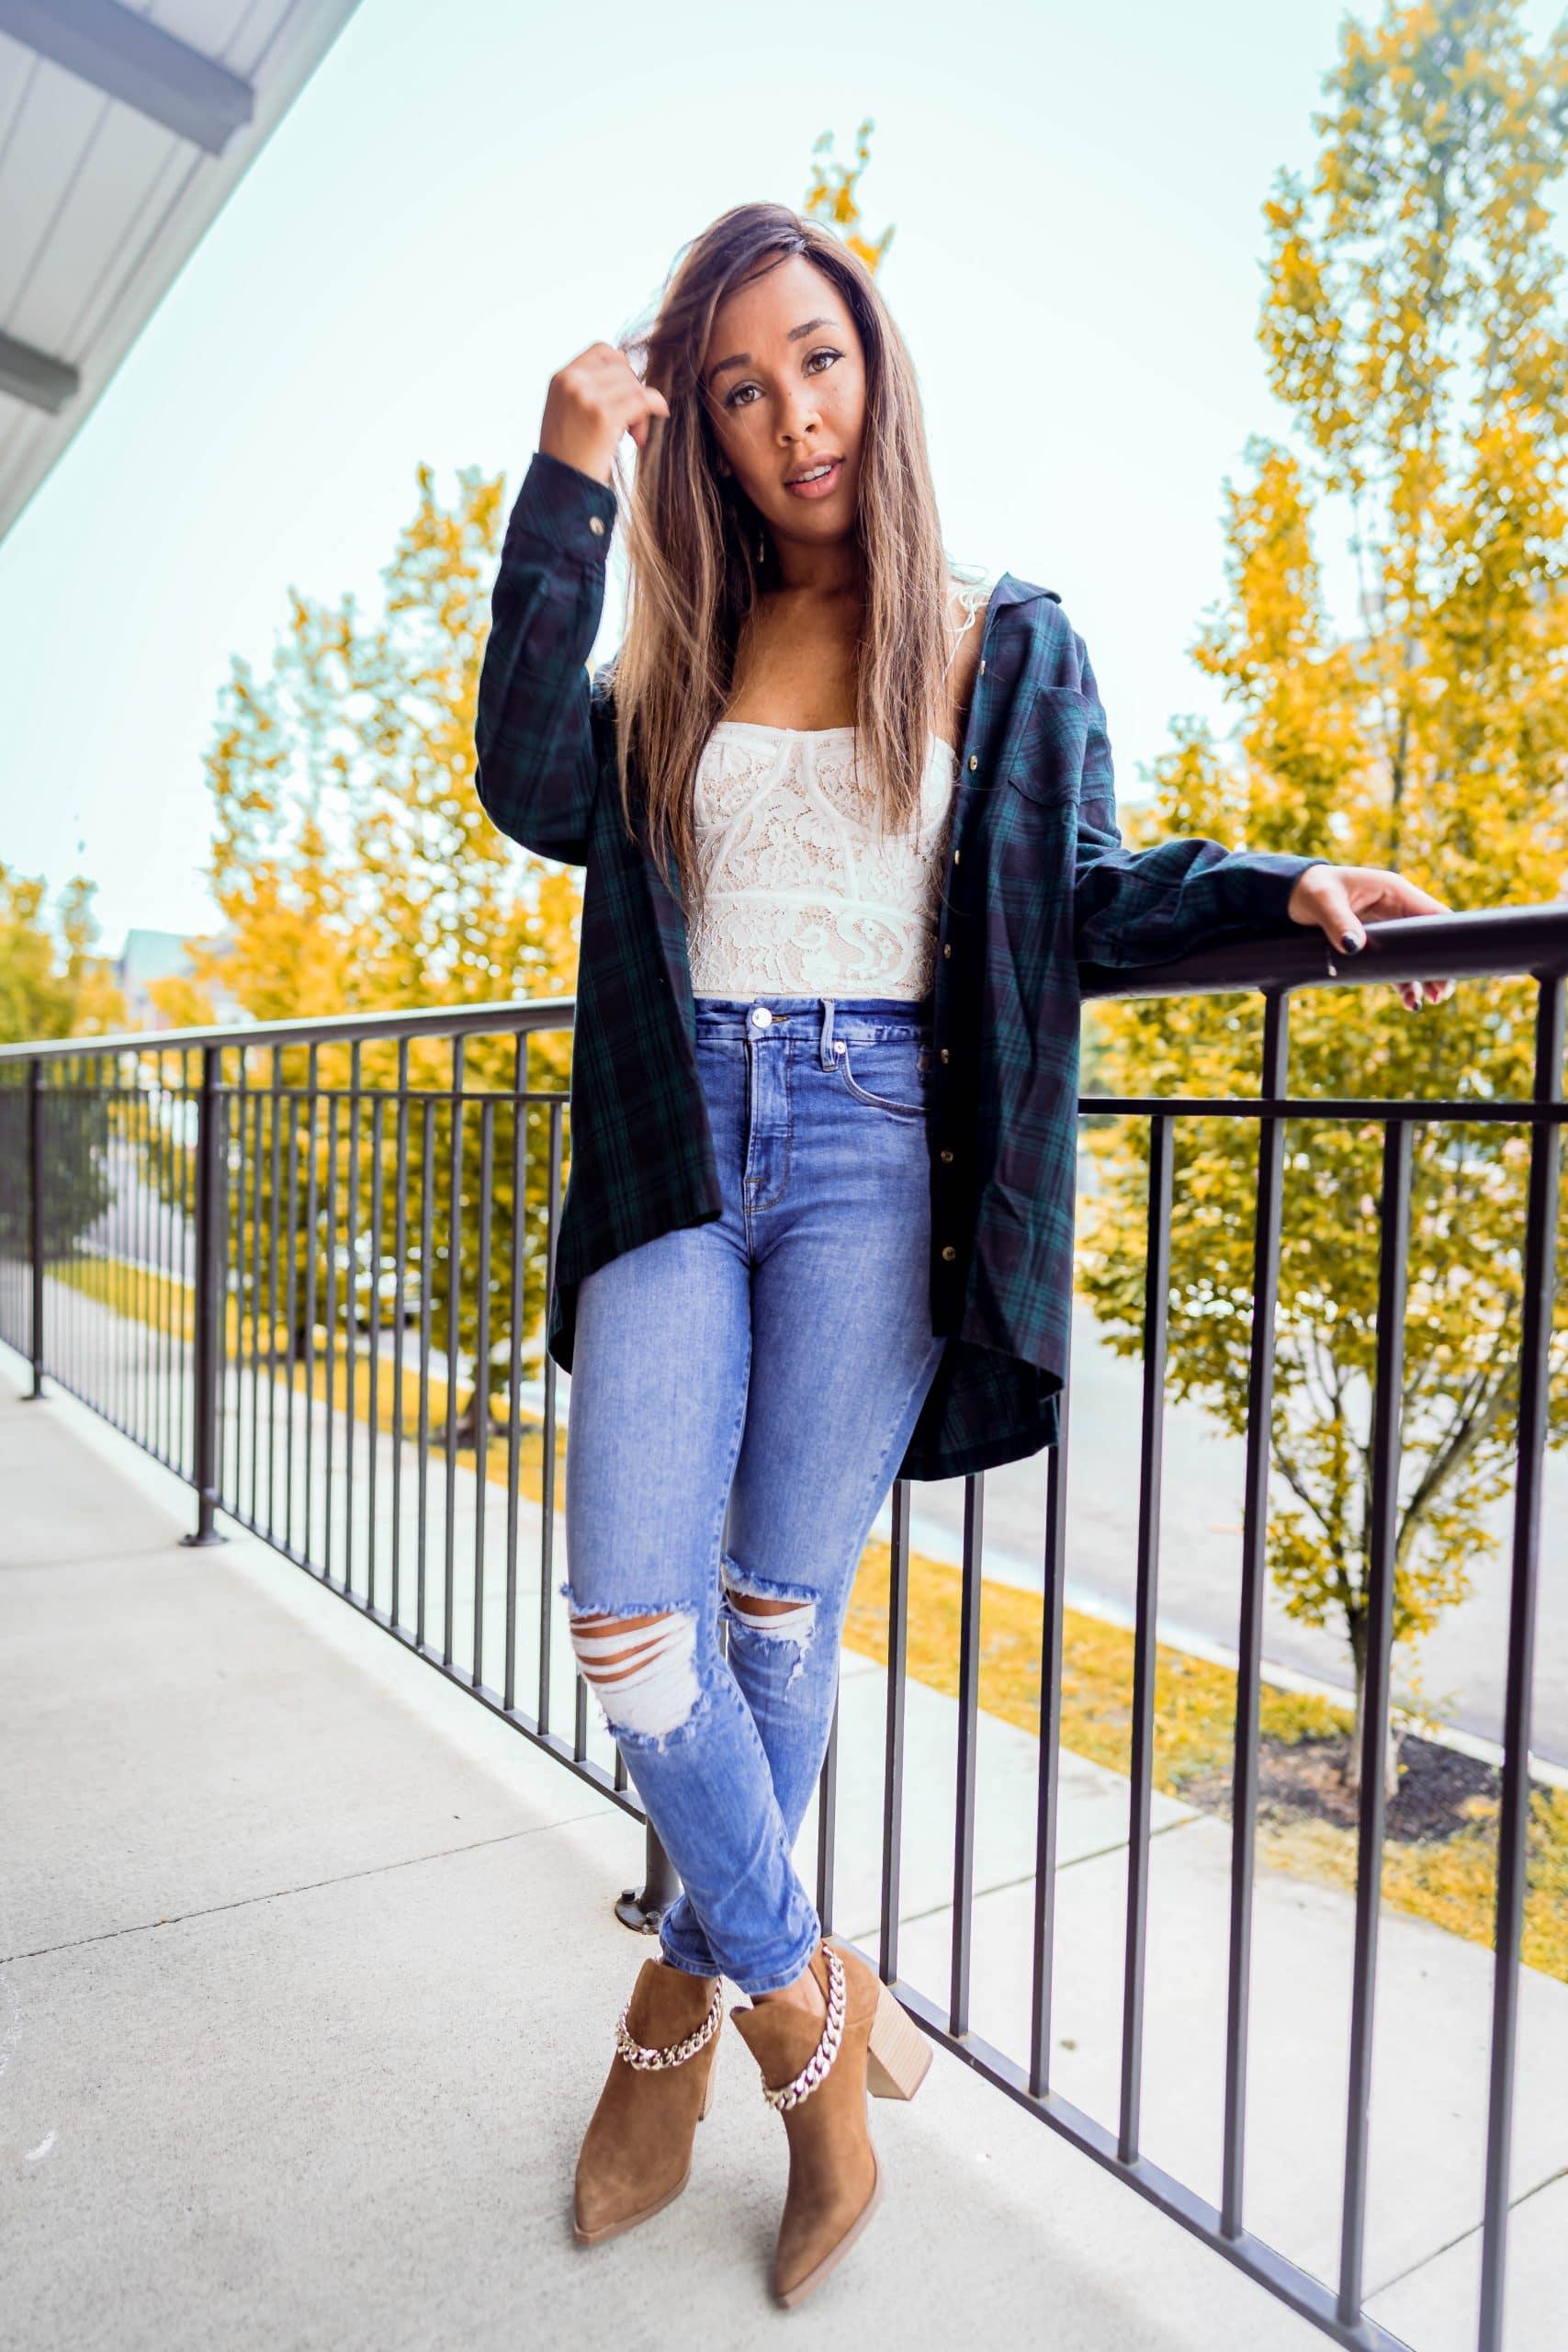 livinglesh style an oversized flannel